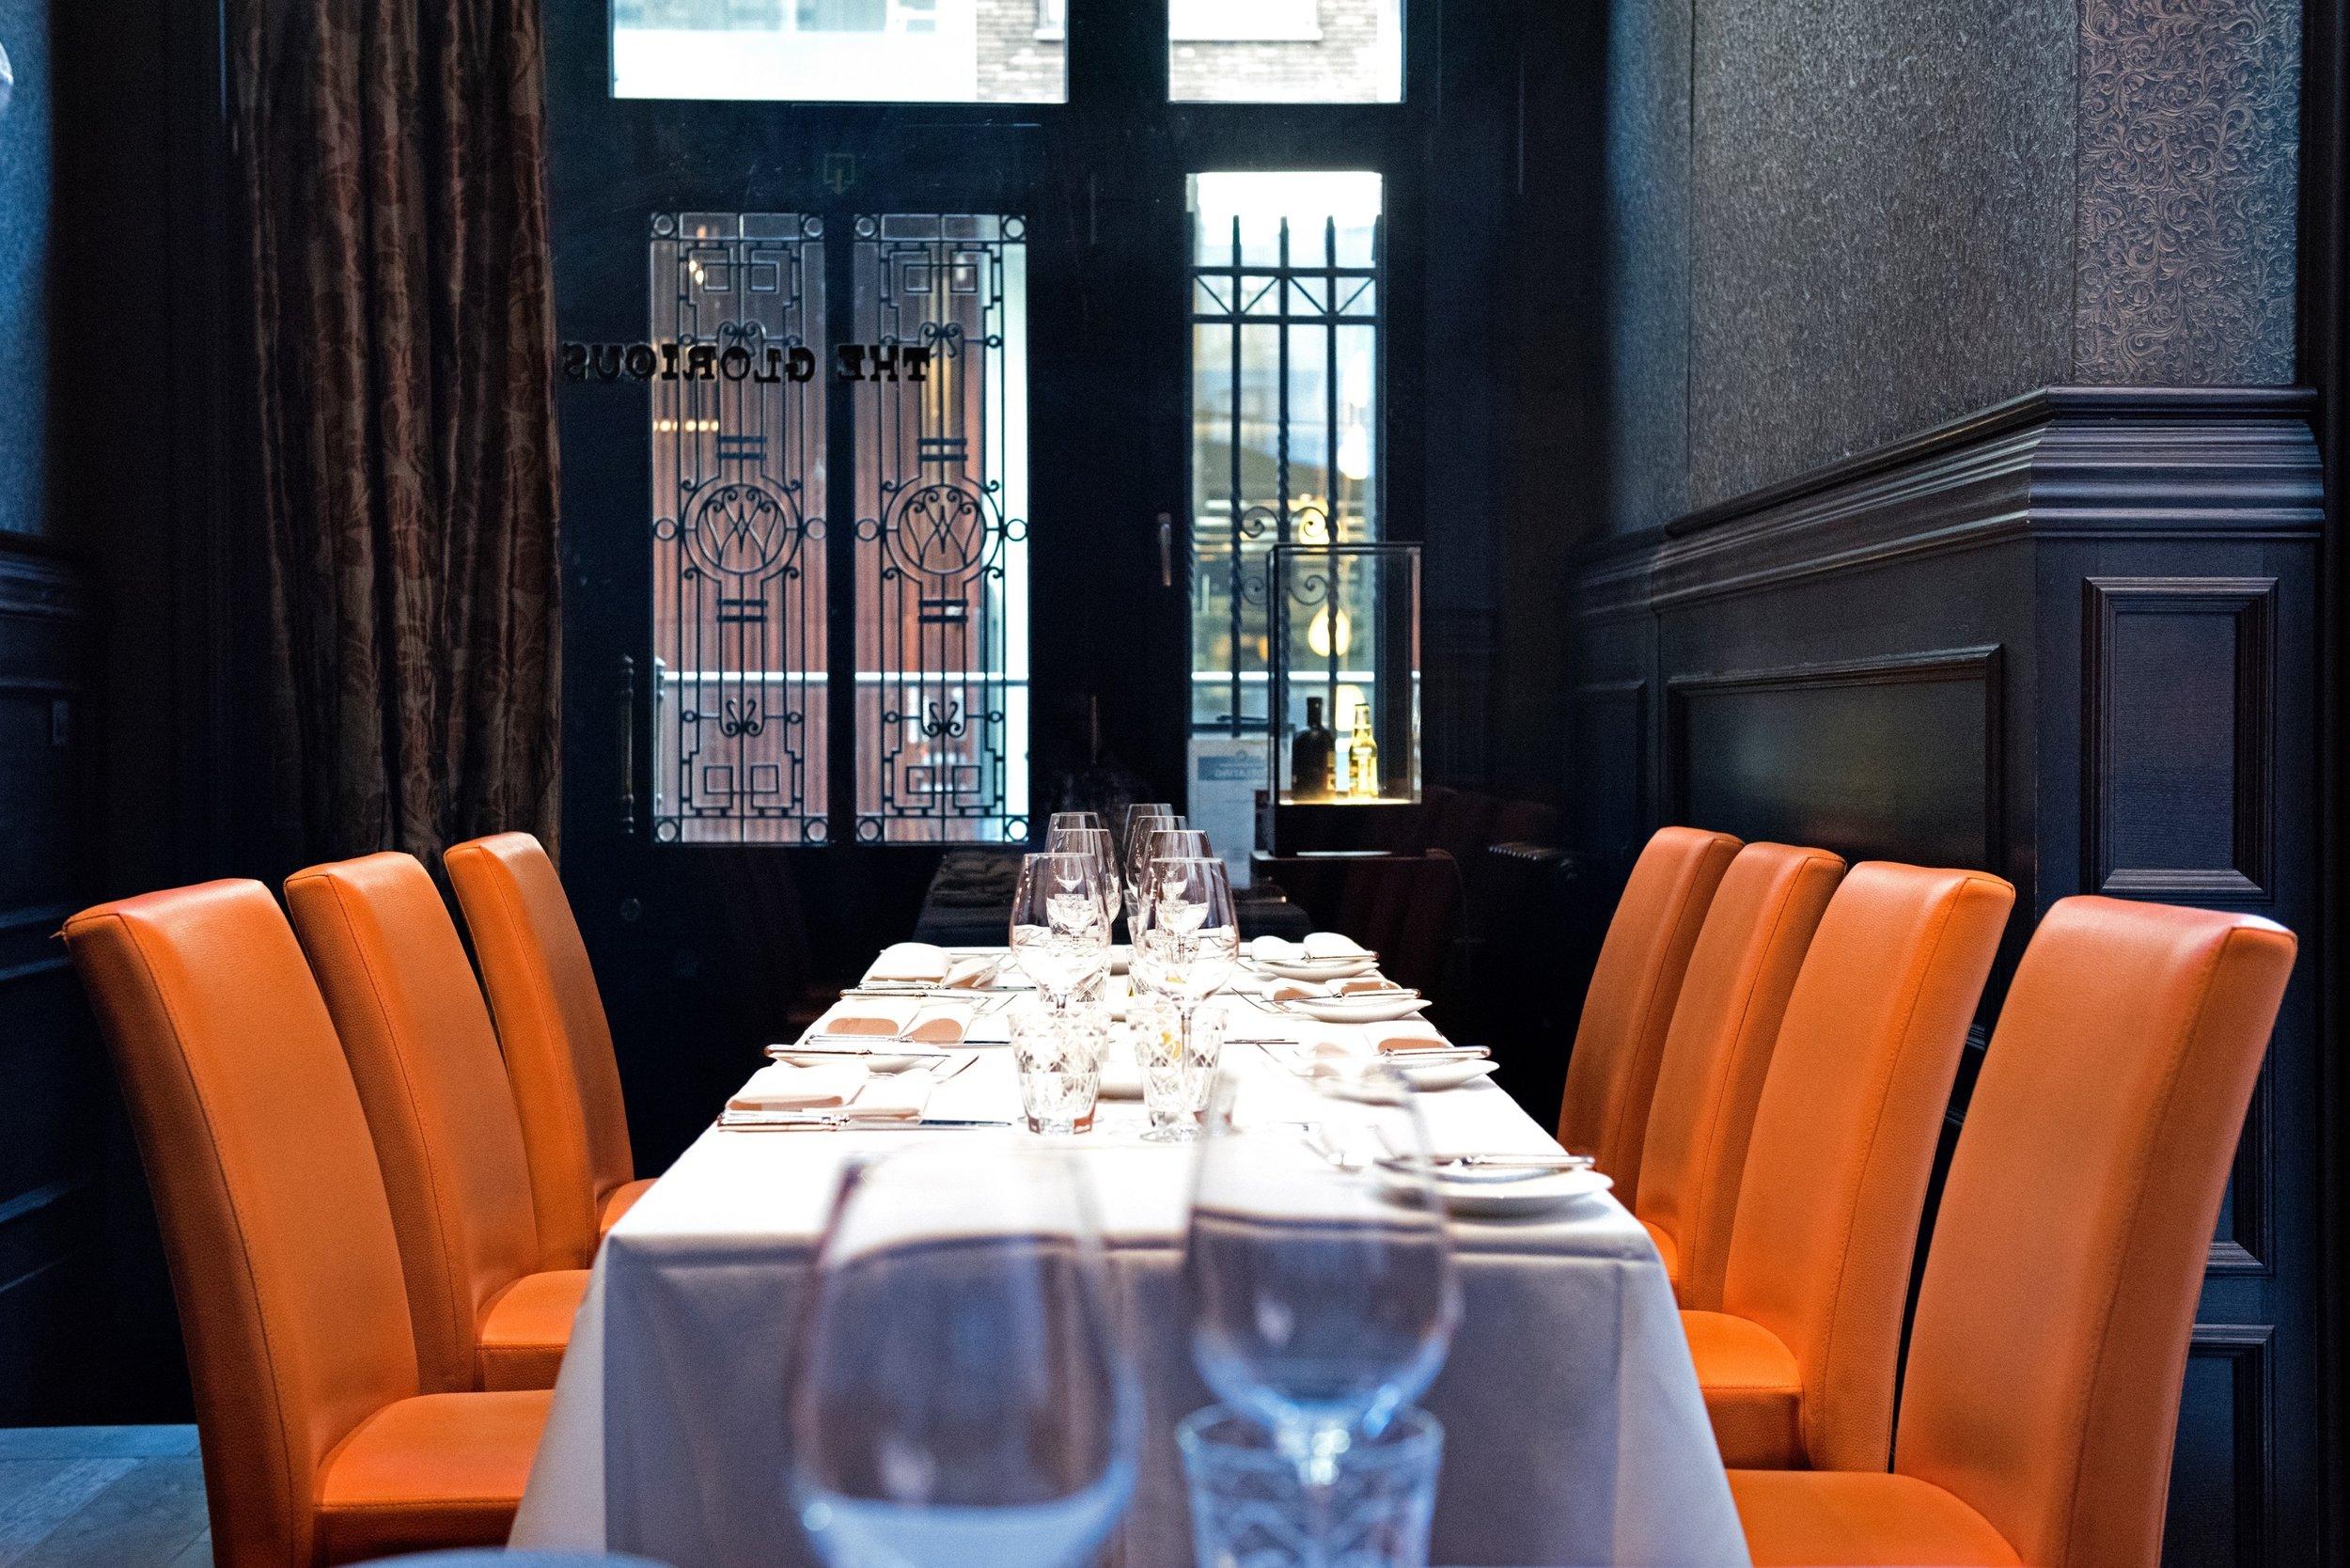 19 michelin restaurant the glorious antwerpen tablefever bart albrecht.jpg